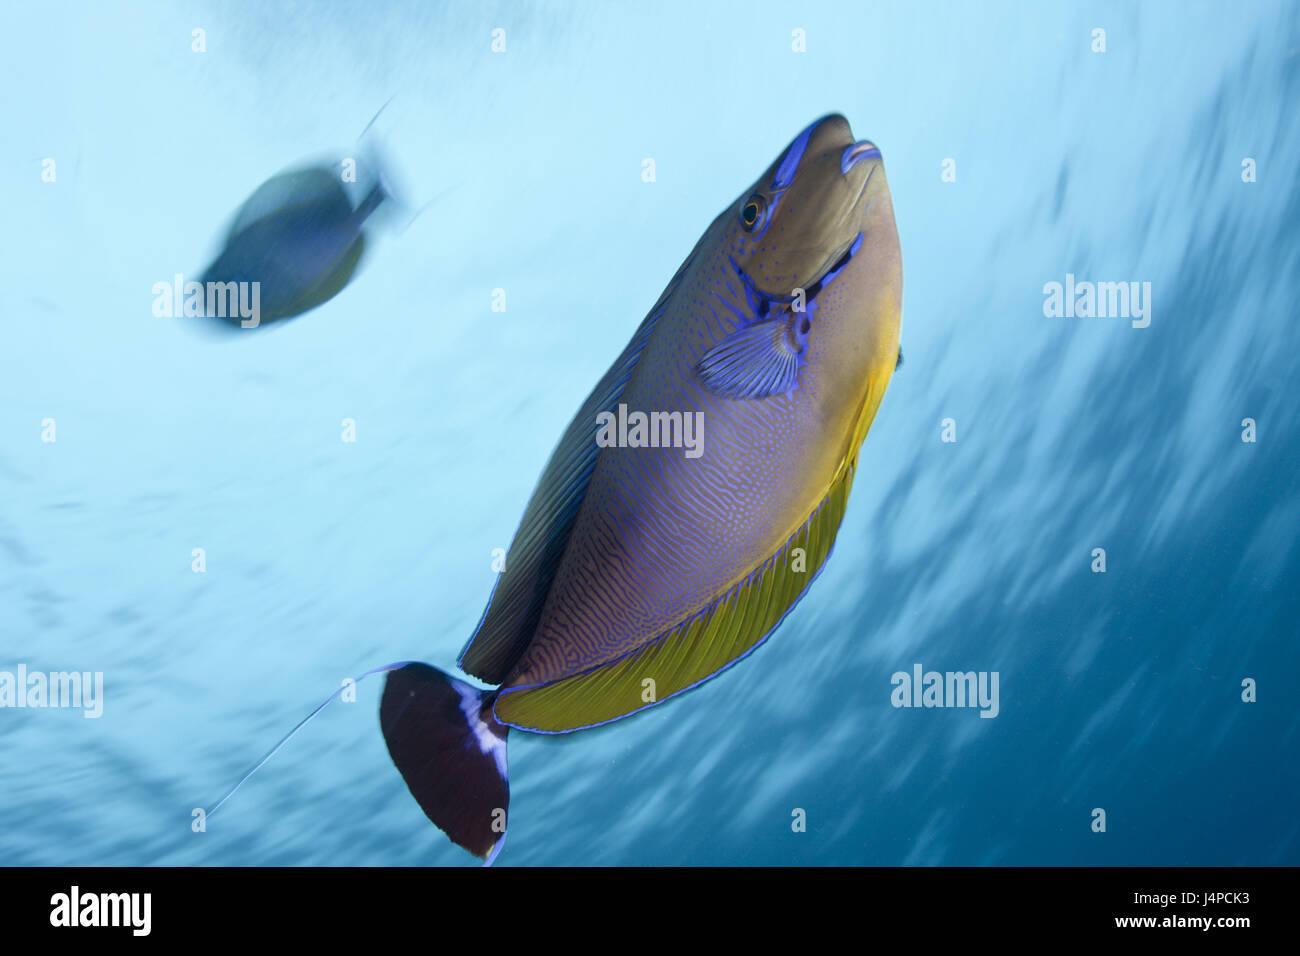 Masks-nasal doctor, Naso vlamingii, the Maldives, Guraidhoo channel, the south times atoll, Stock Photo